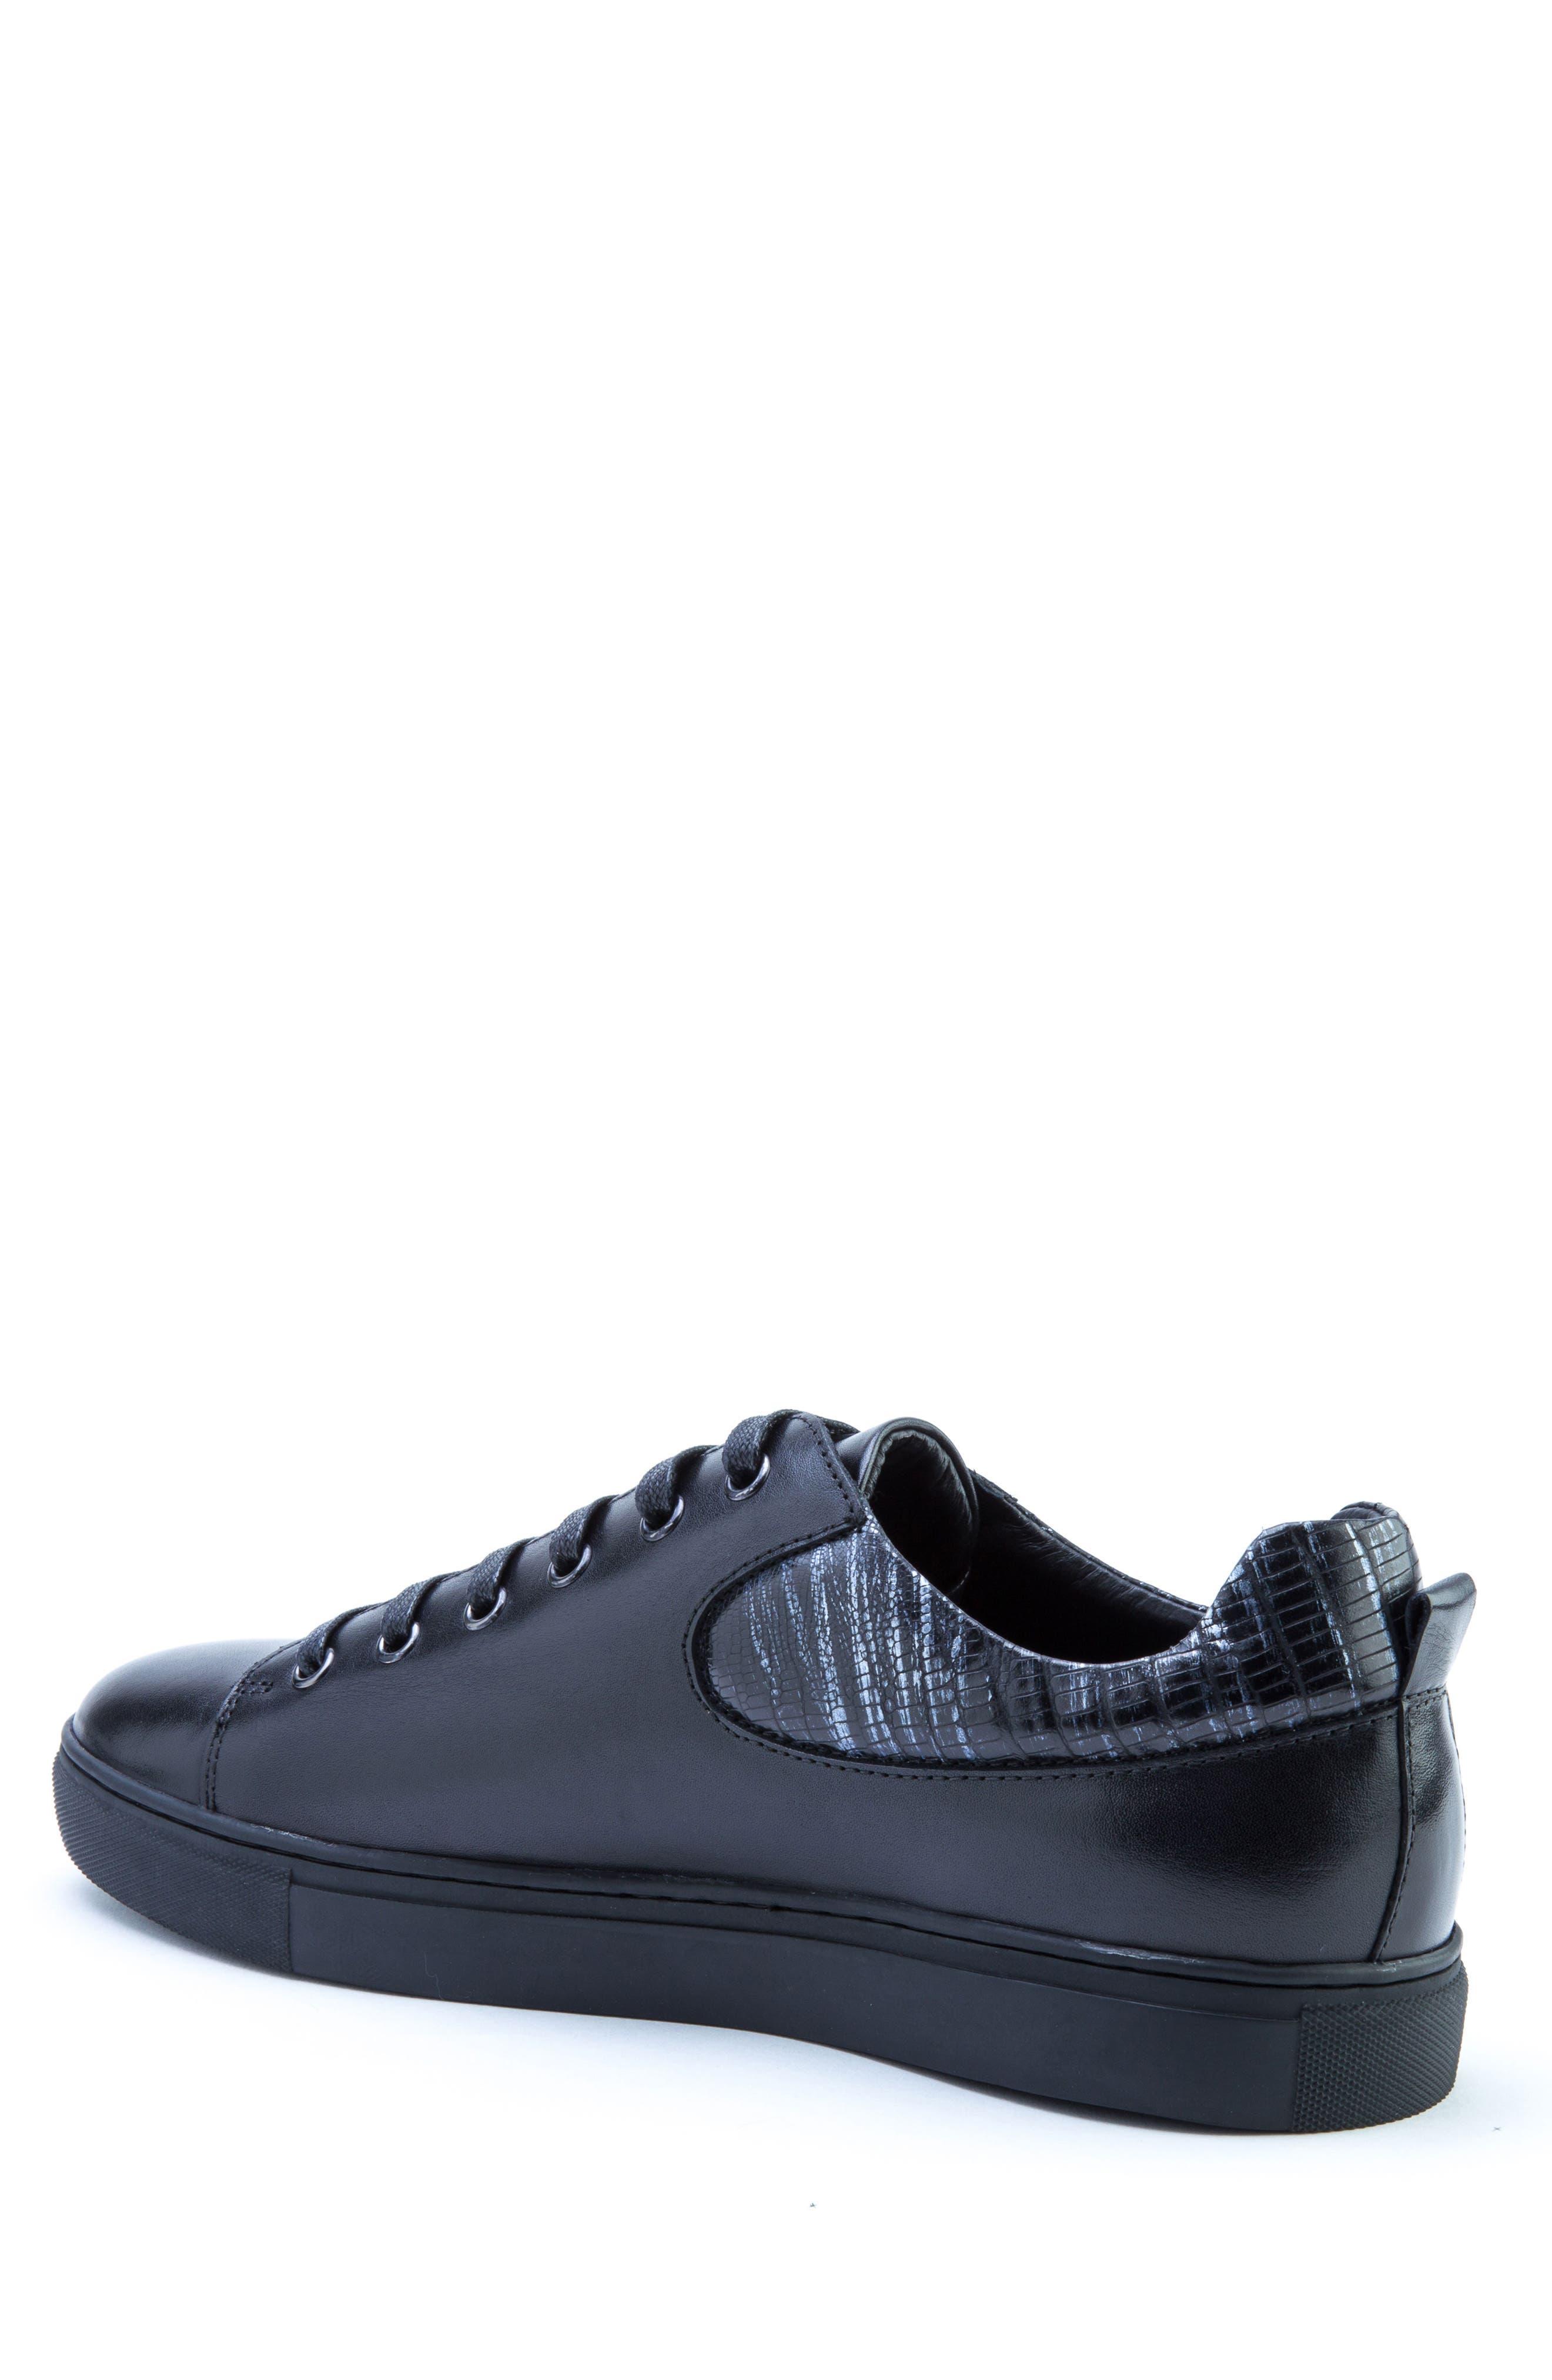 Robinson Sneaker,                             Alternate thumbnail 2, color,                             Black Leather